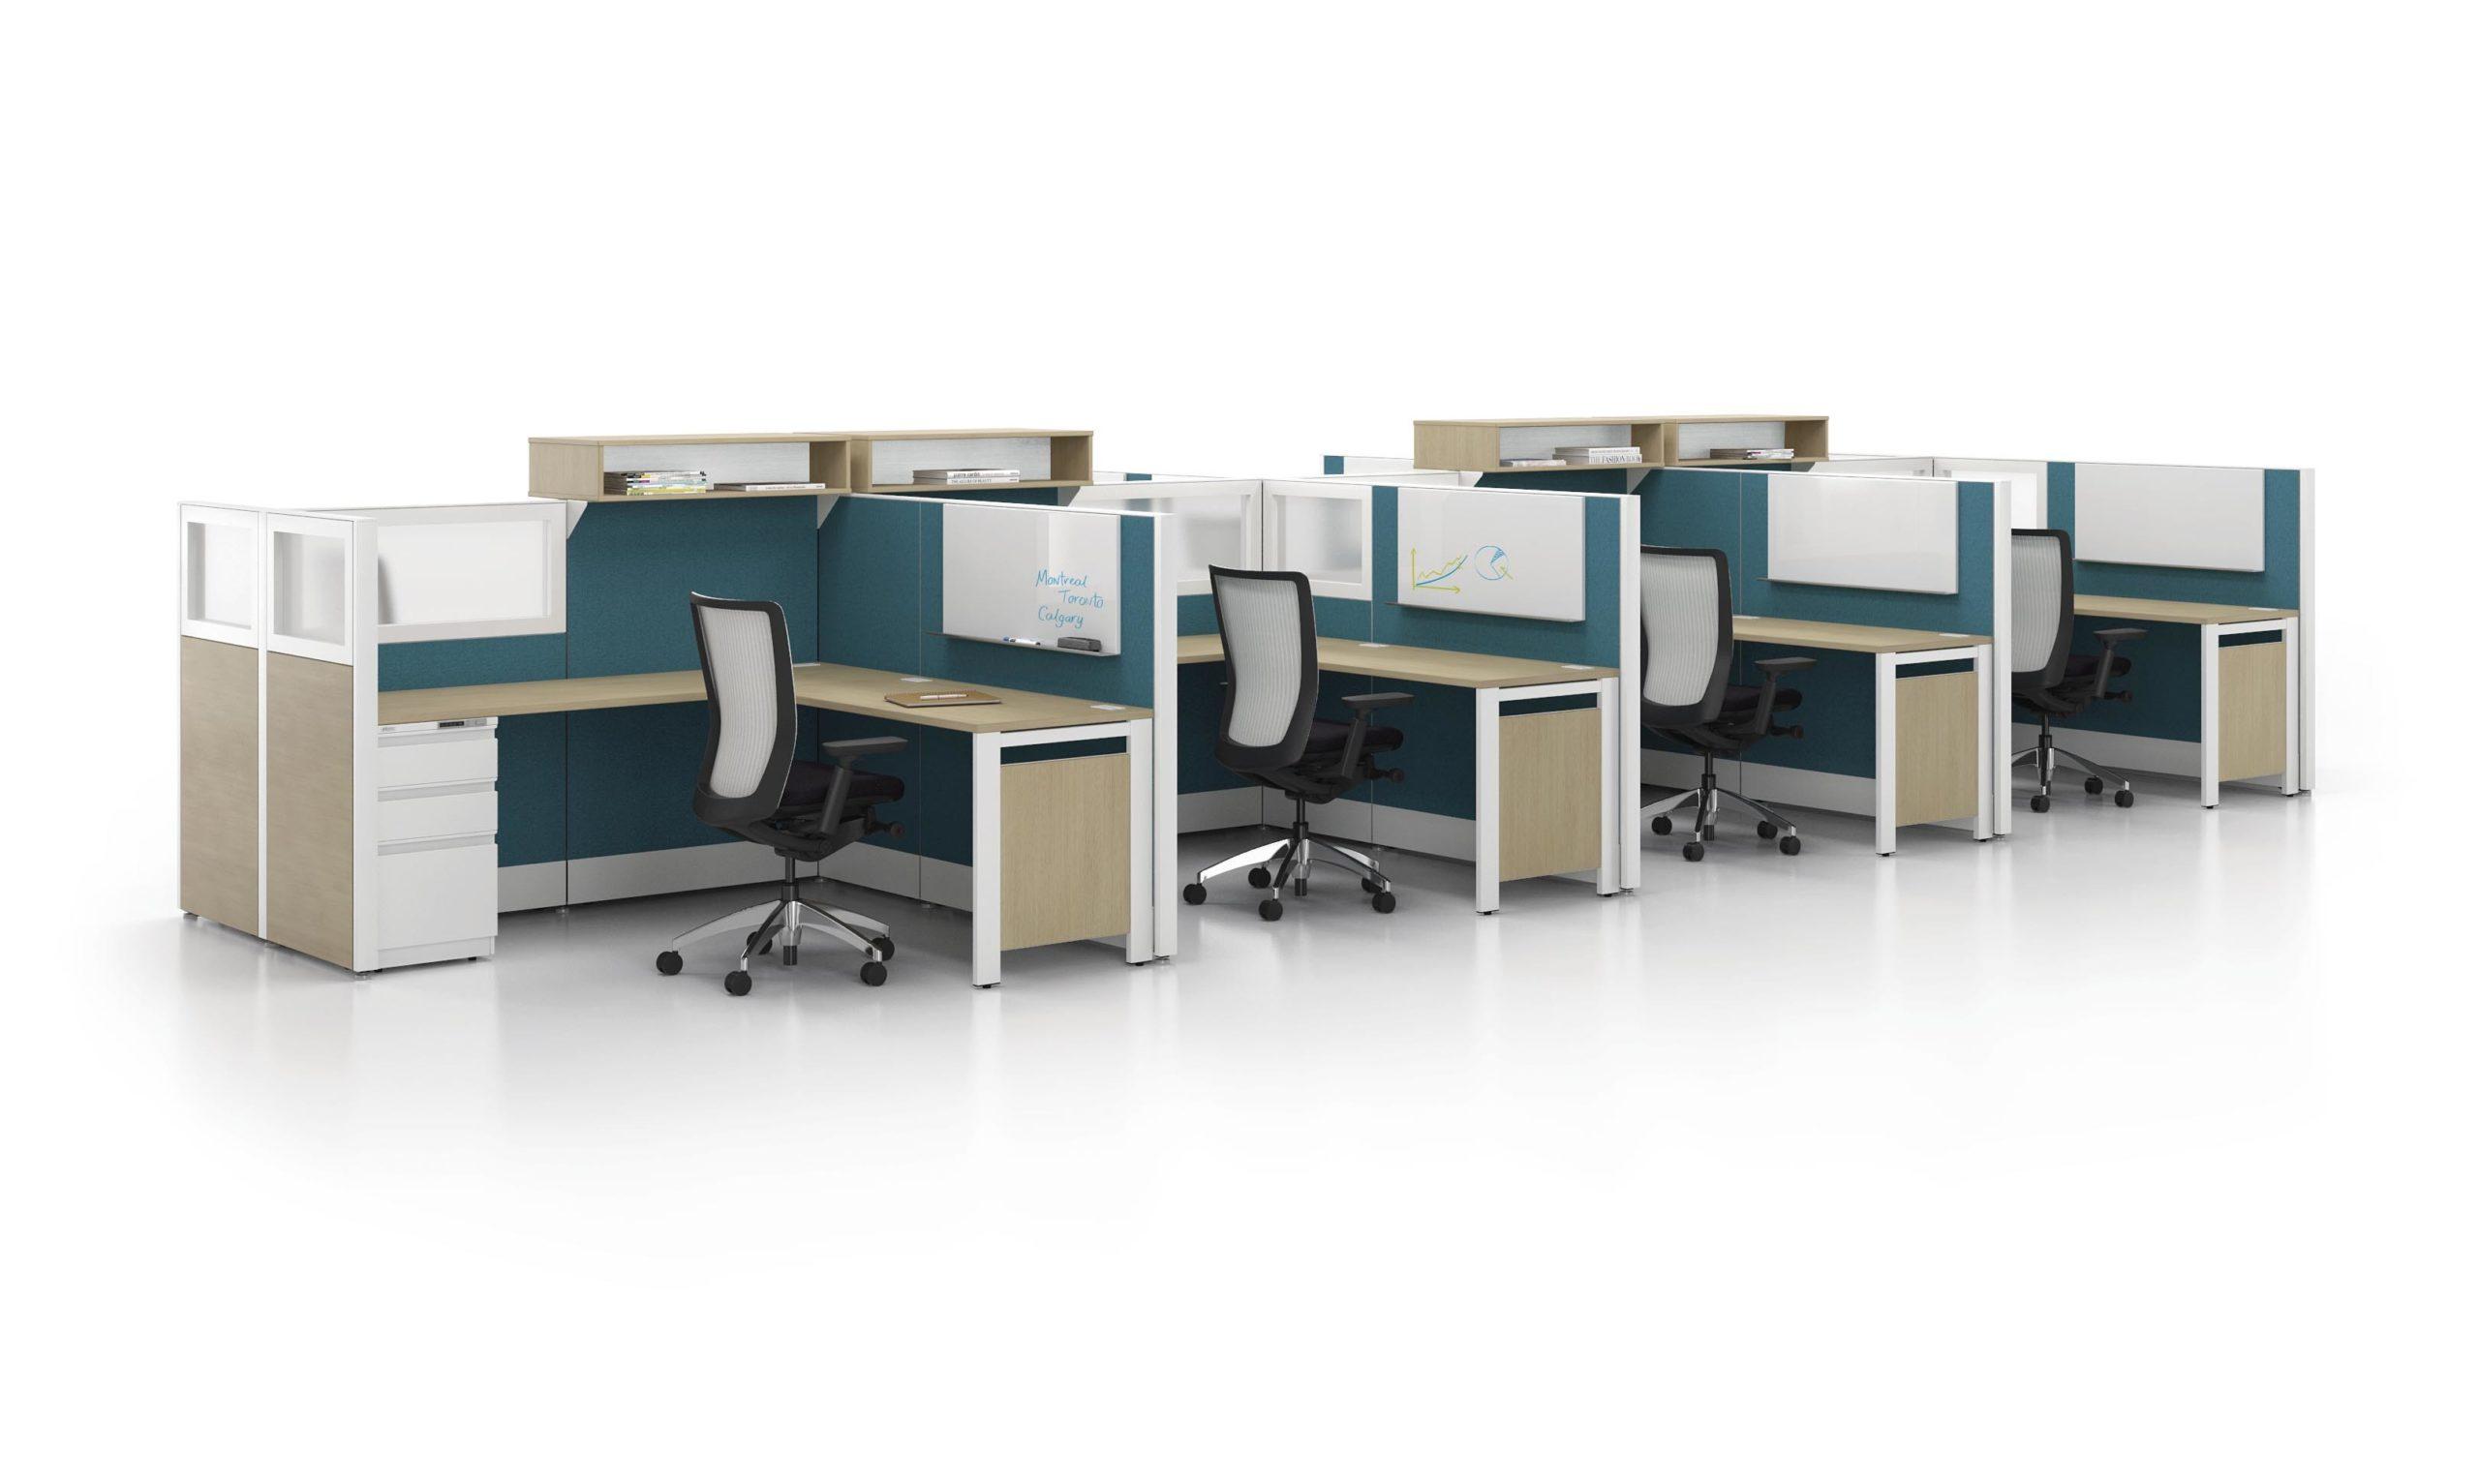 social distancing cubicles